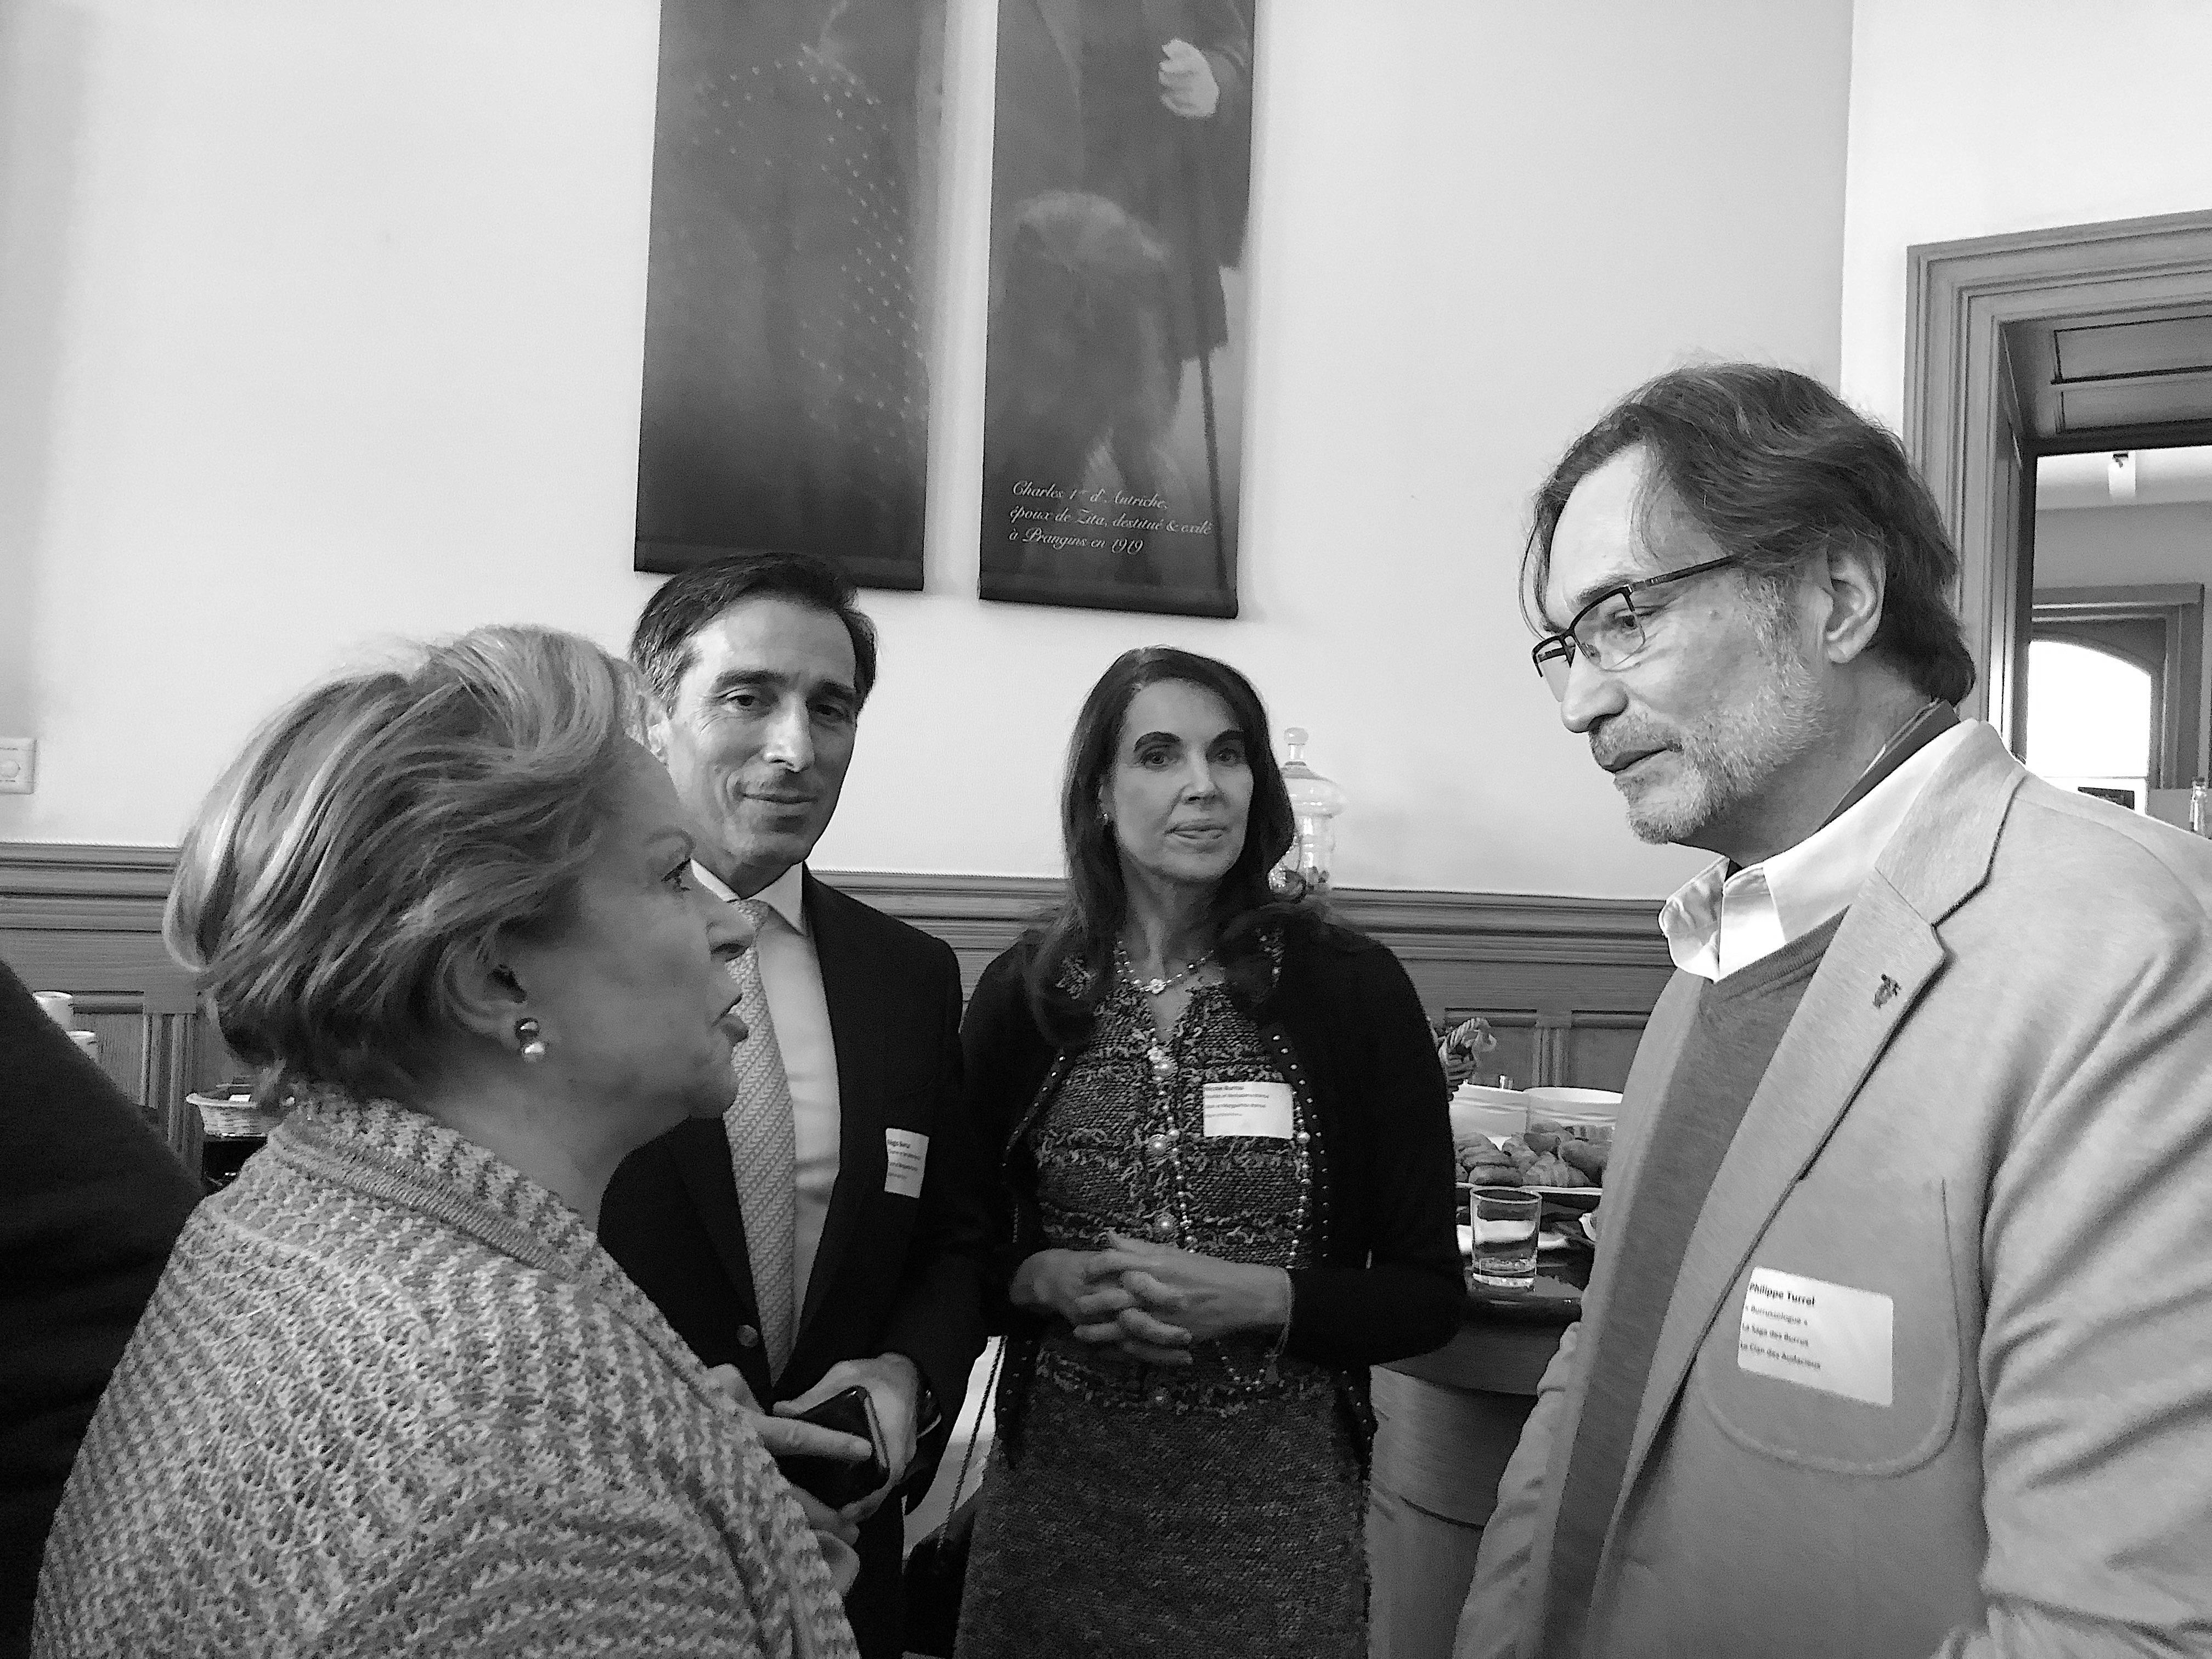 Nado,Régis,Nicole_Burrus_avec_Philippe_T